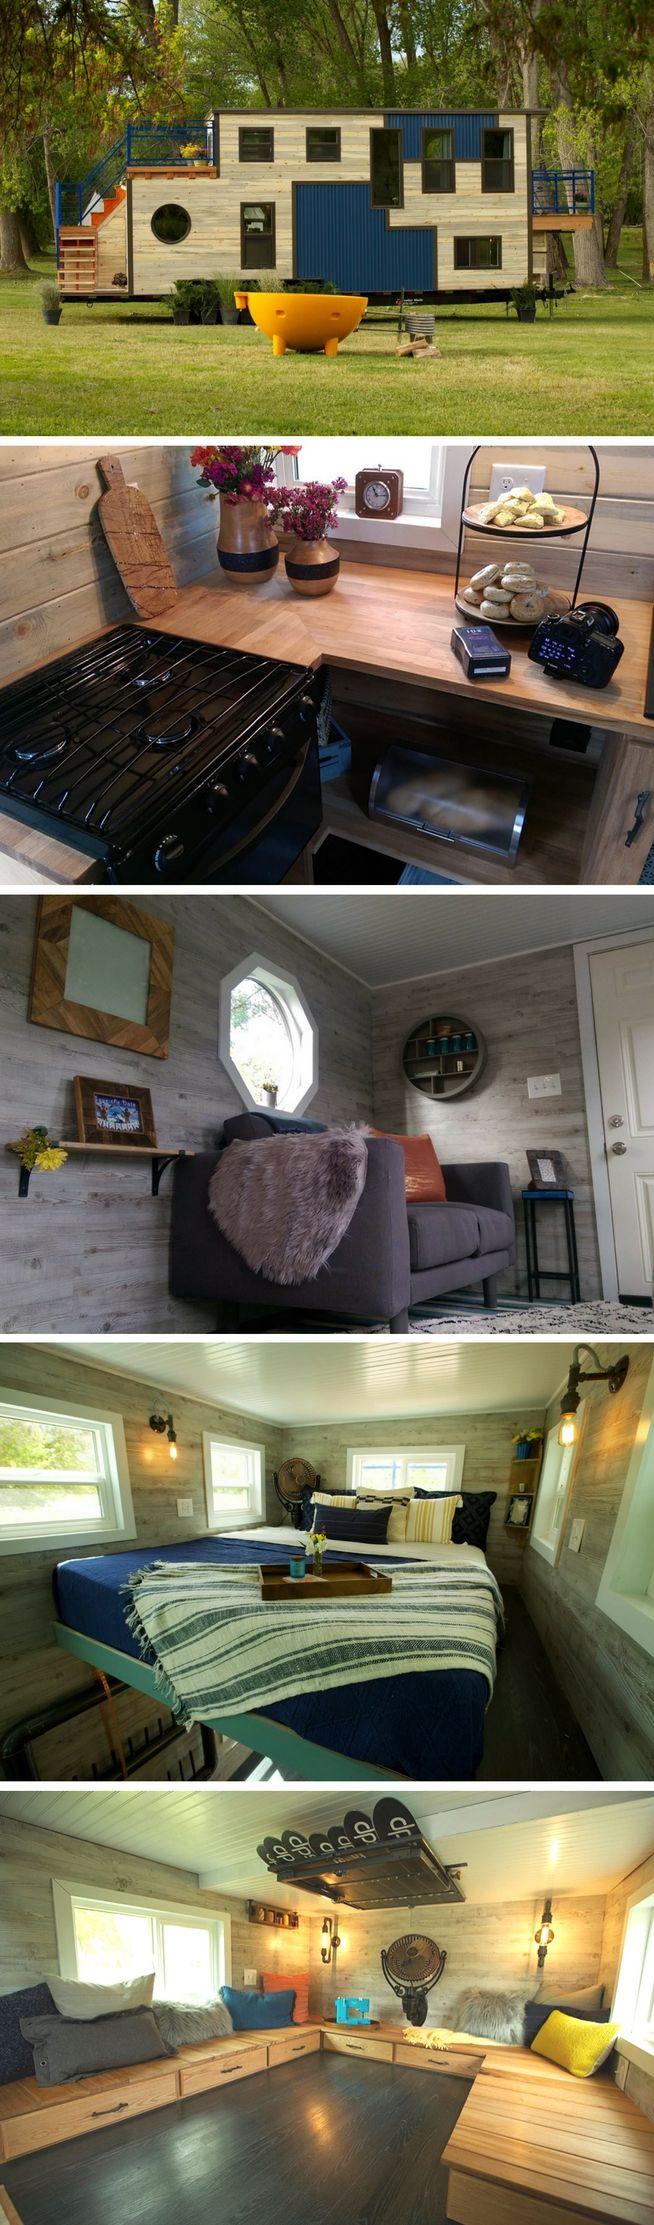 The Tiny Ski House, featured on Tiny House Nation